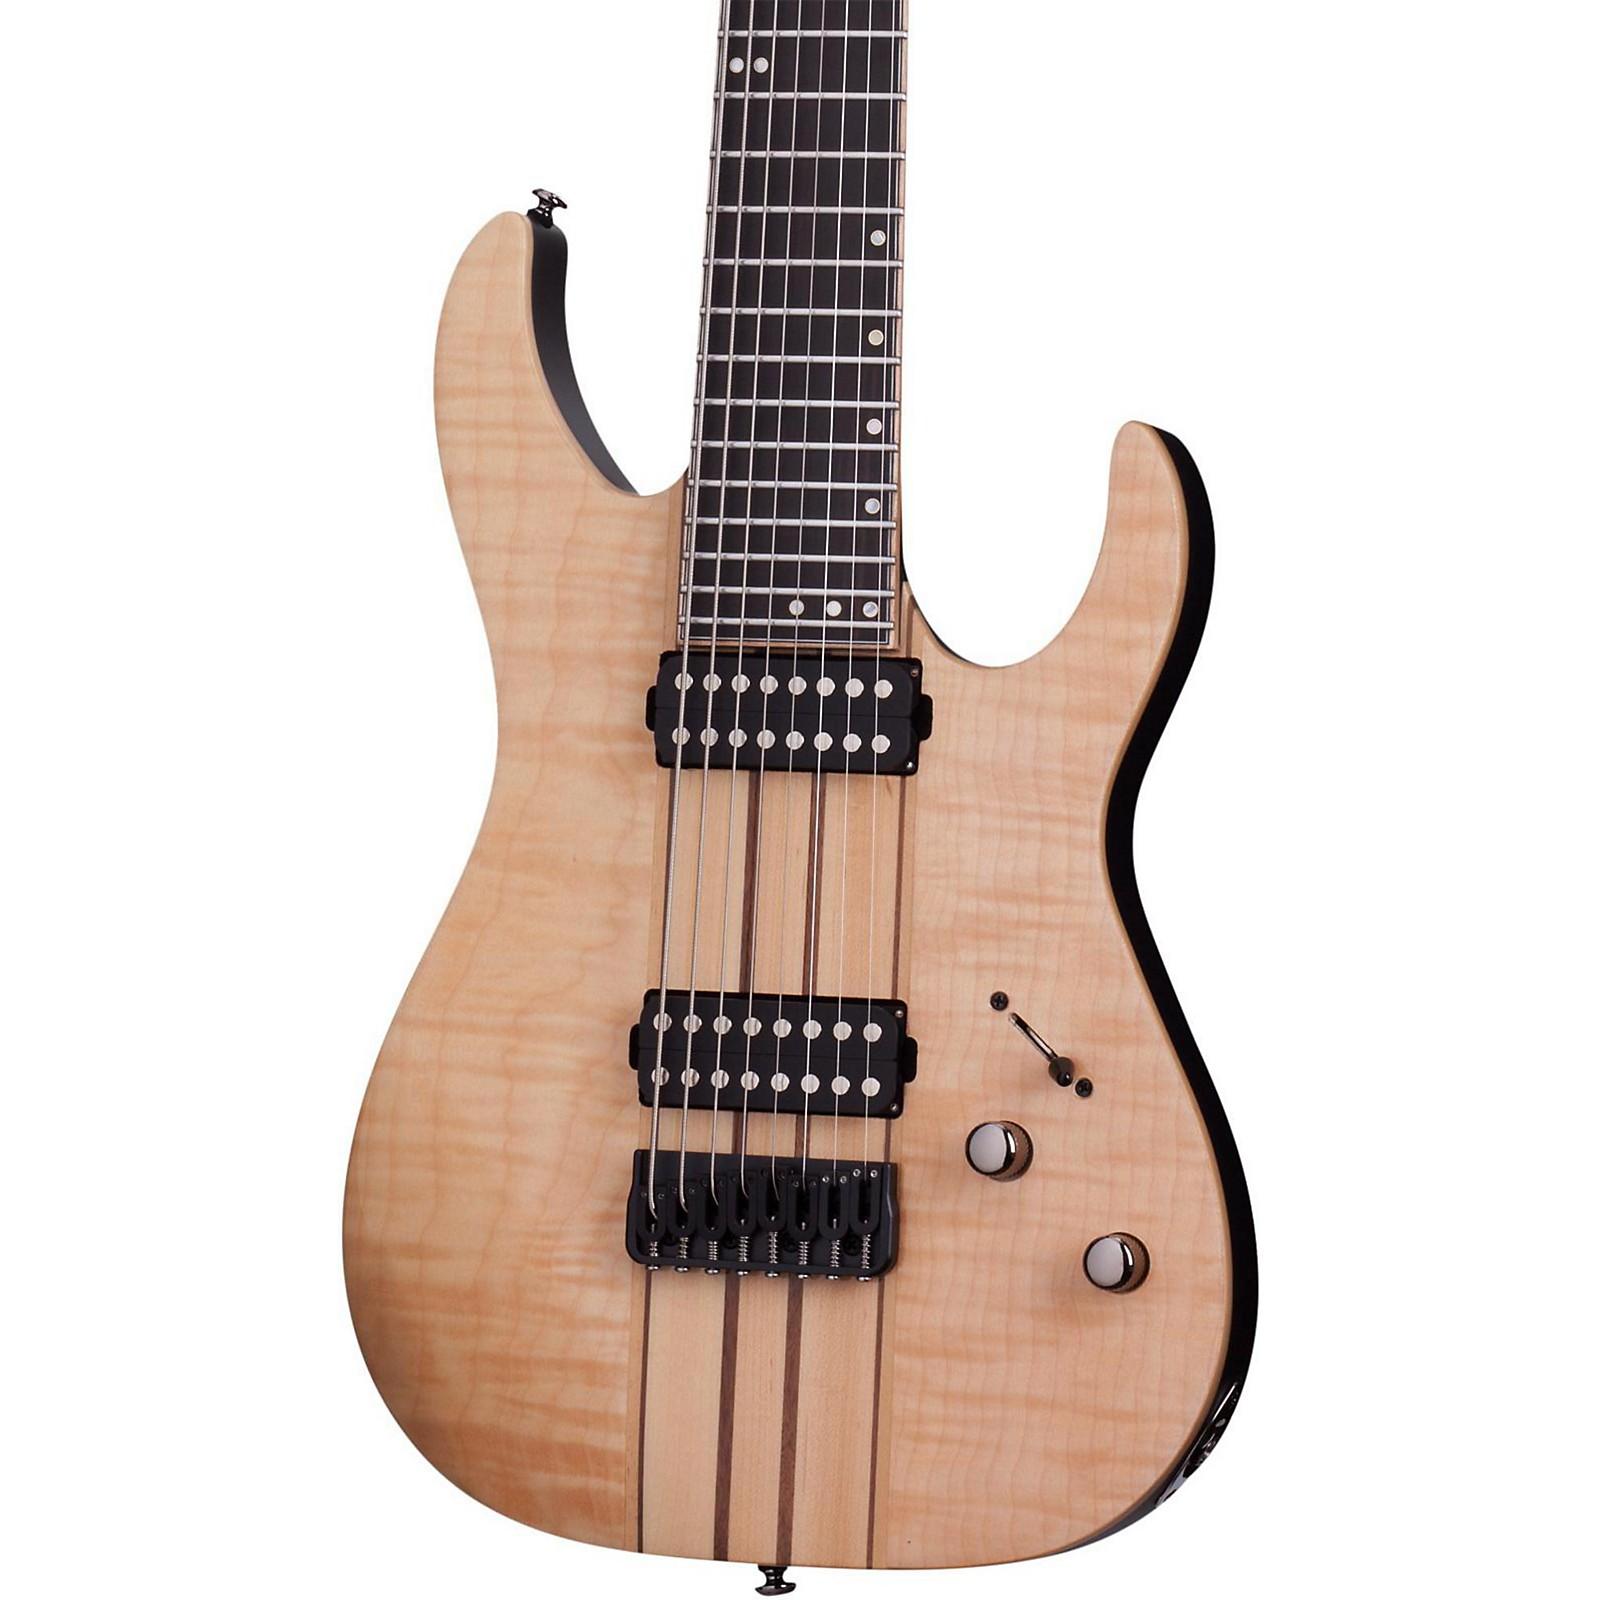 Schecter Guitar Research Banshee Elite-8 Eight-String Electric Guitar